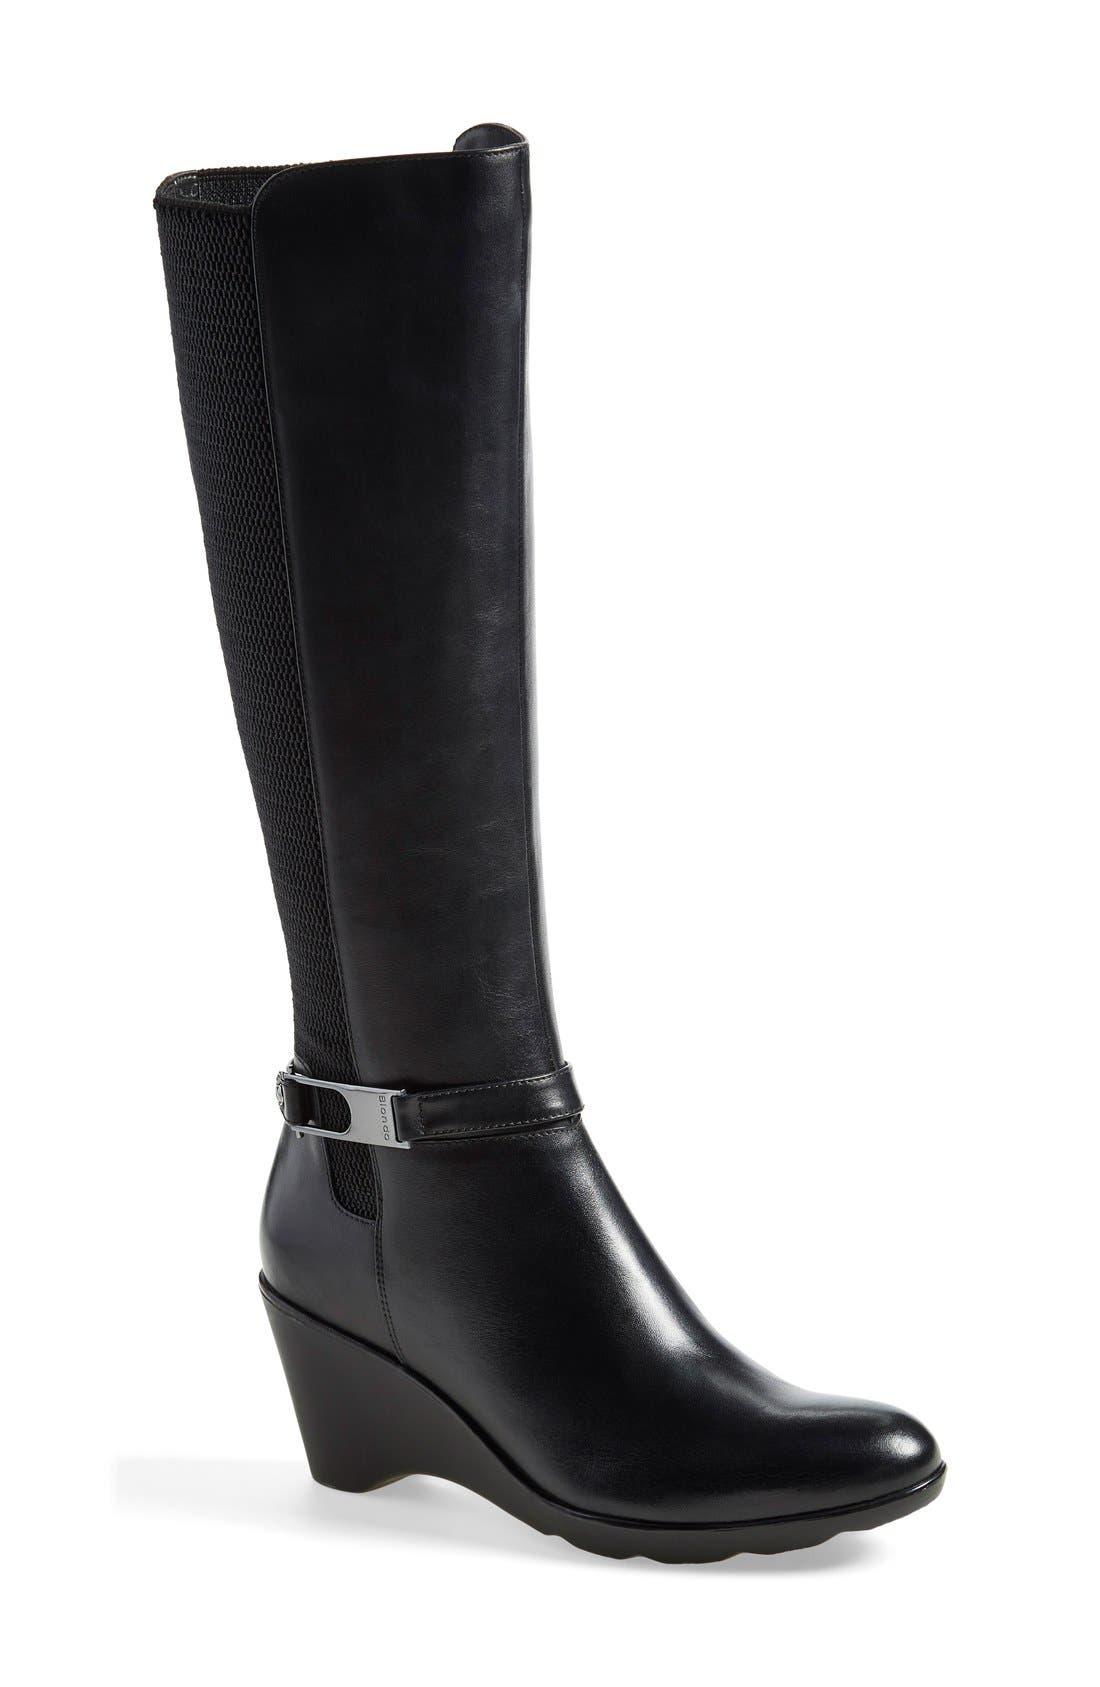 Main Image - Blondo 'Laina' Waterproof Boot (Women) (Nordstrom Exclusive)